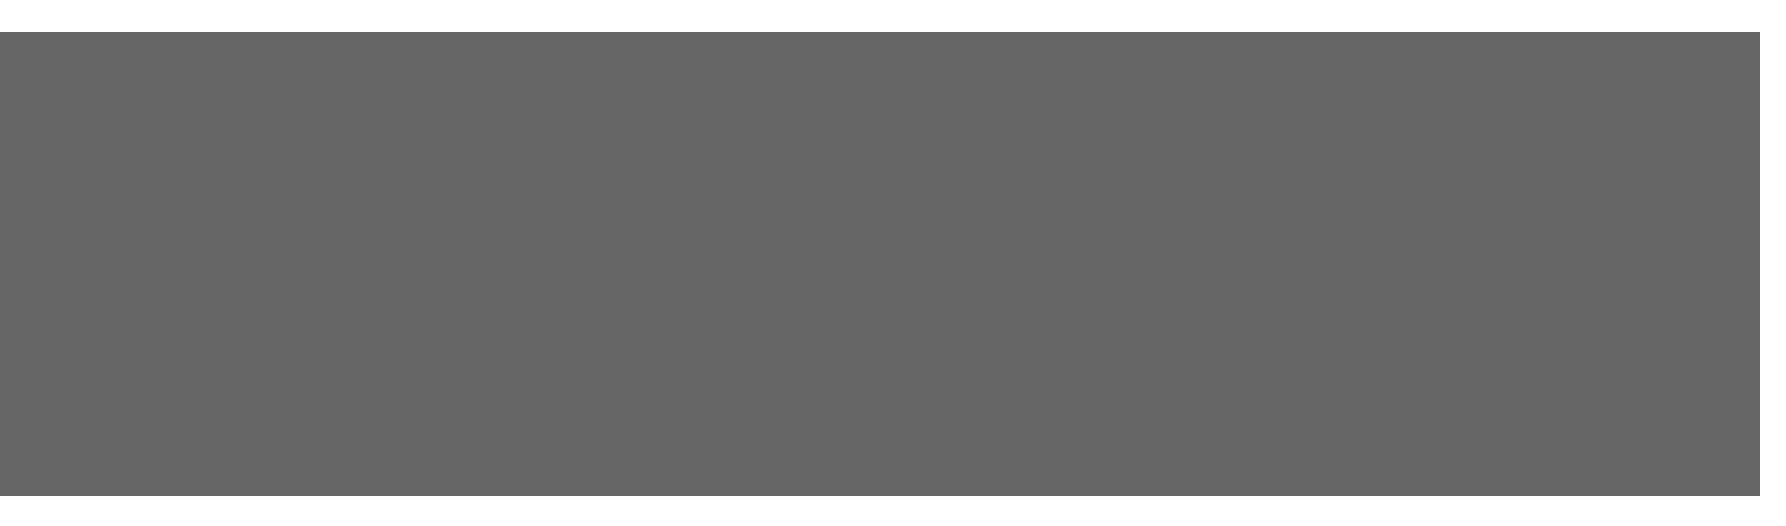 Kinesiologisch Praktijk voor professionele kinesiologie Den Bosch e.o.